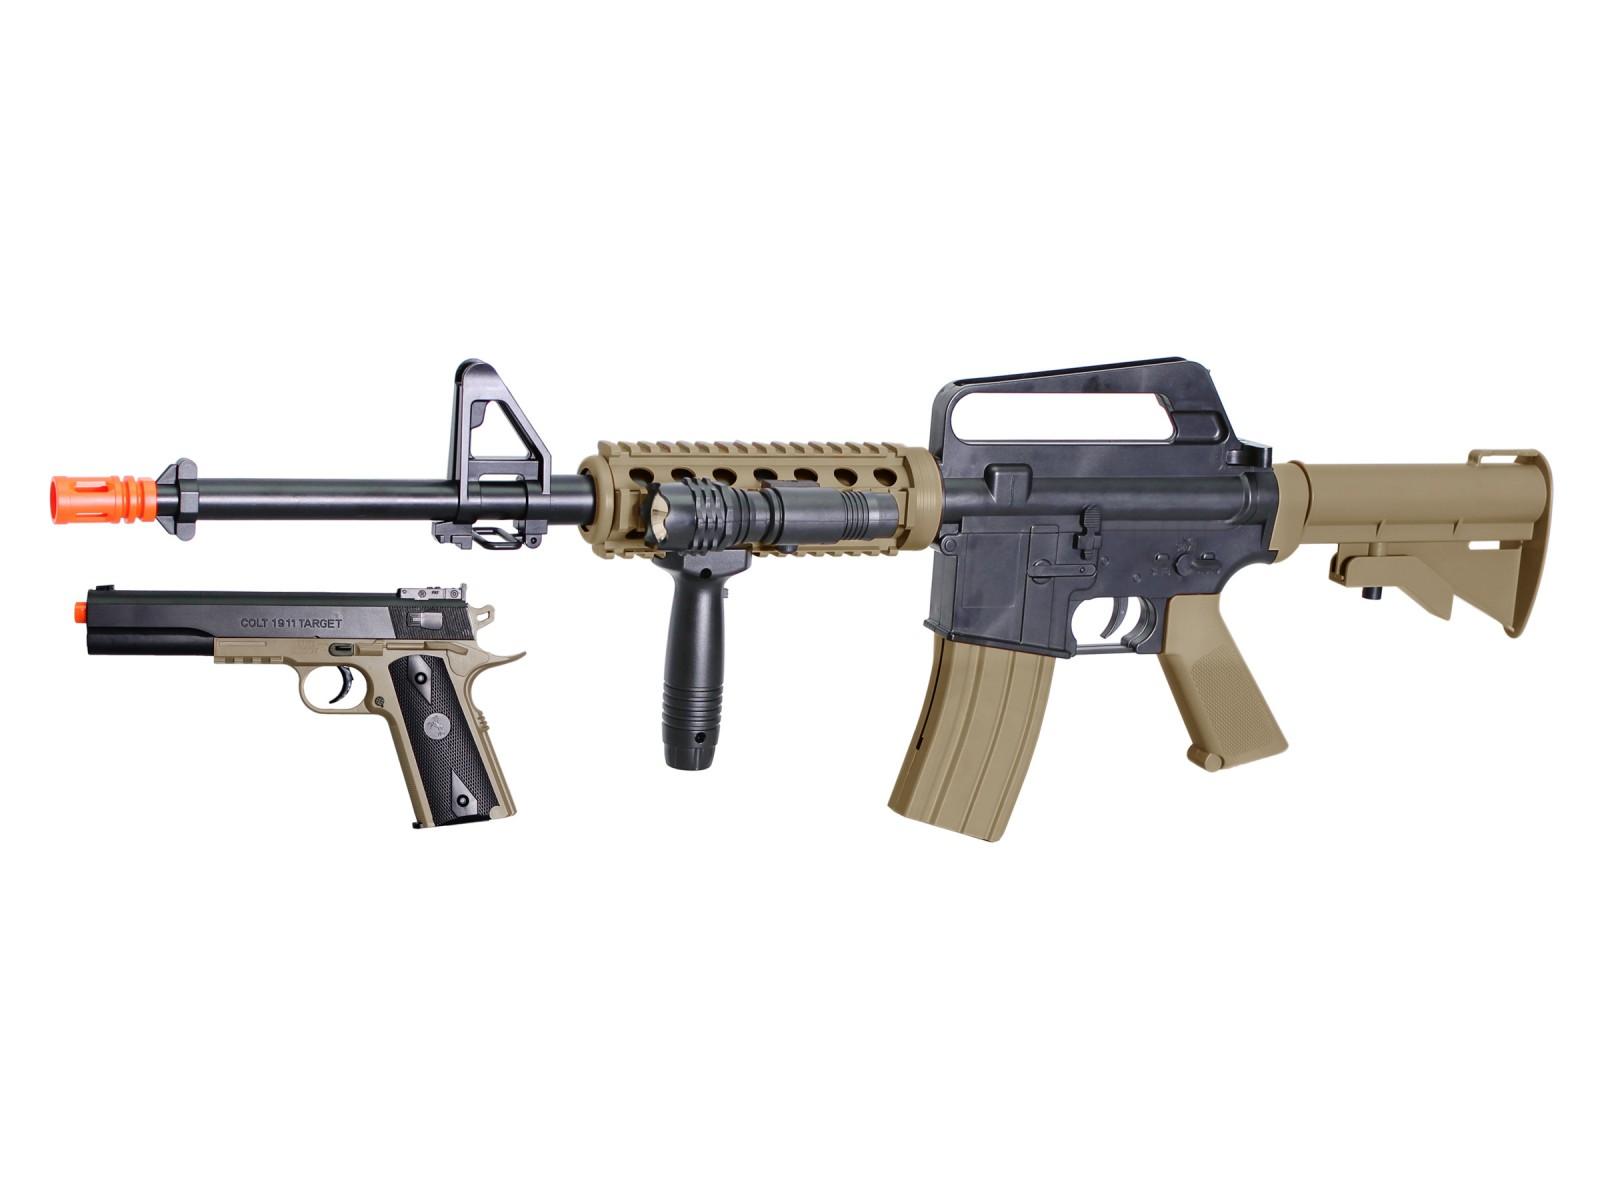 Colt_M4_RIS_&_1911_Spring_Airsoft_Kit_BlackTan_6mm